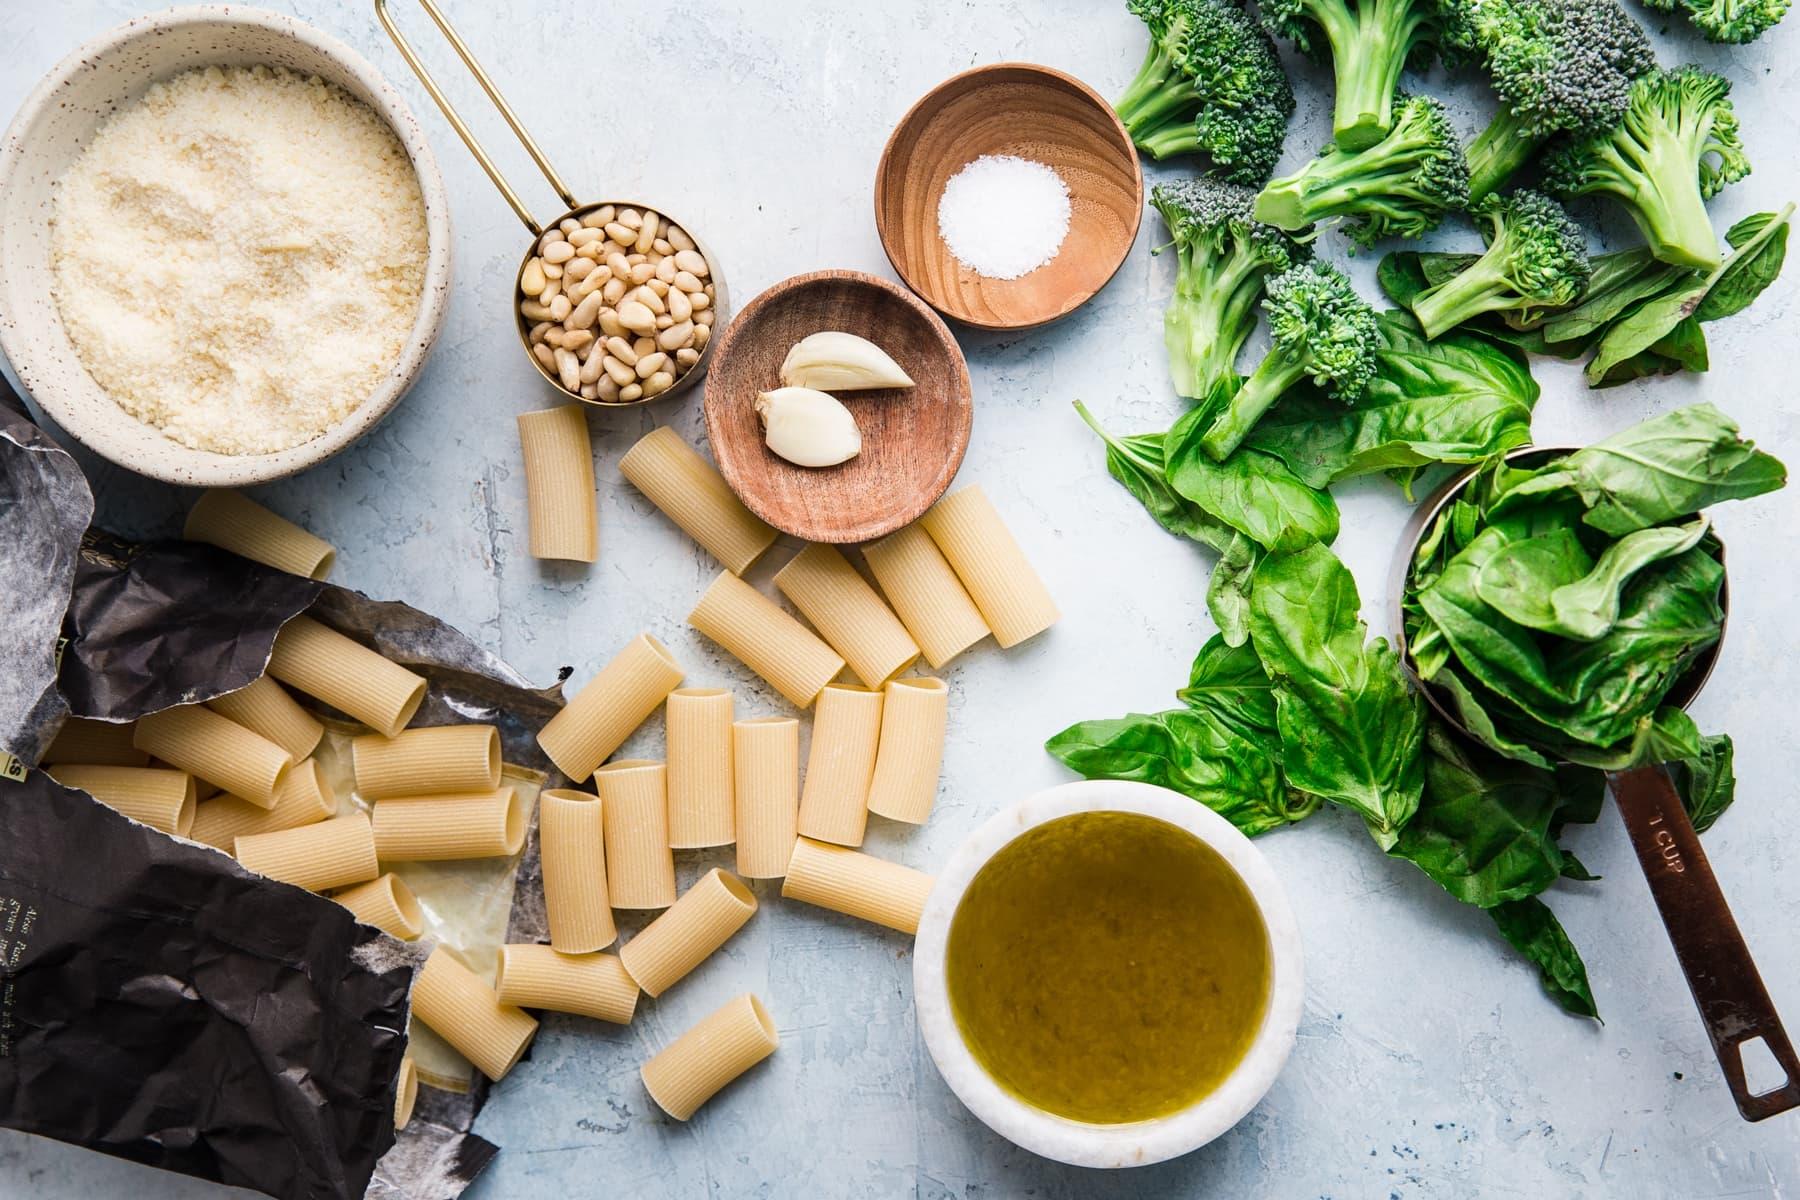 Zutaten für Brokkoli-Pesto-Nudeln, Rigatoni, Knoblauch-Parmesan, Olivenöl, Pinienkerne, Salz, Basilikum